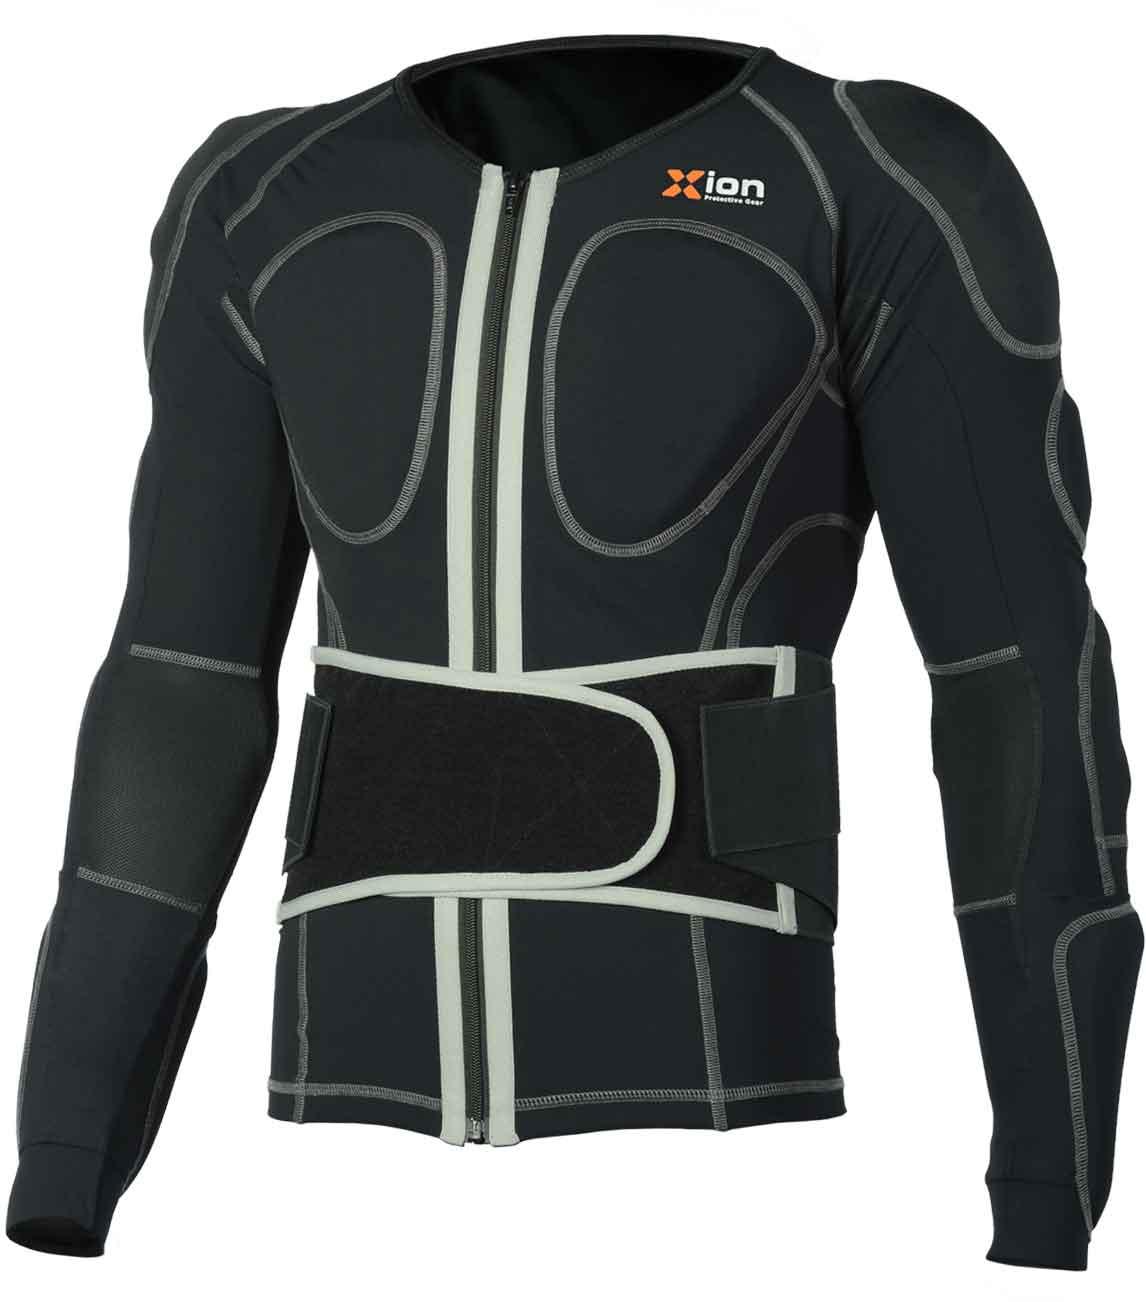 image xion-protective-gear-long-sleeve-jacket-jpg